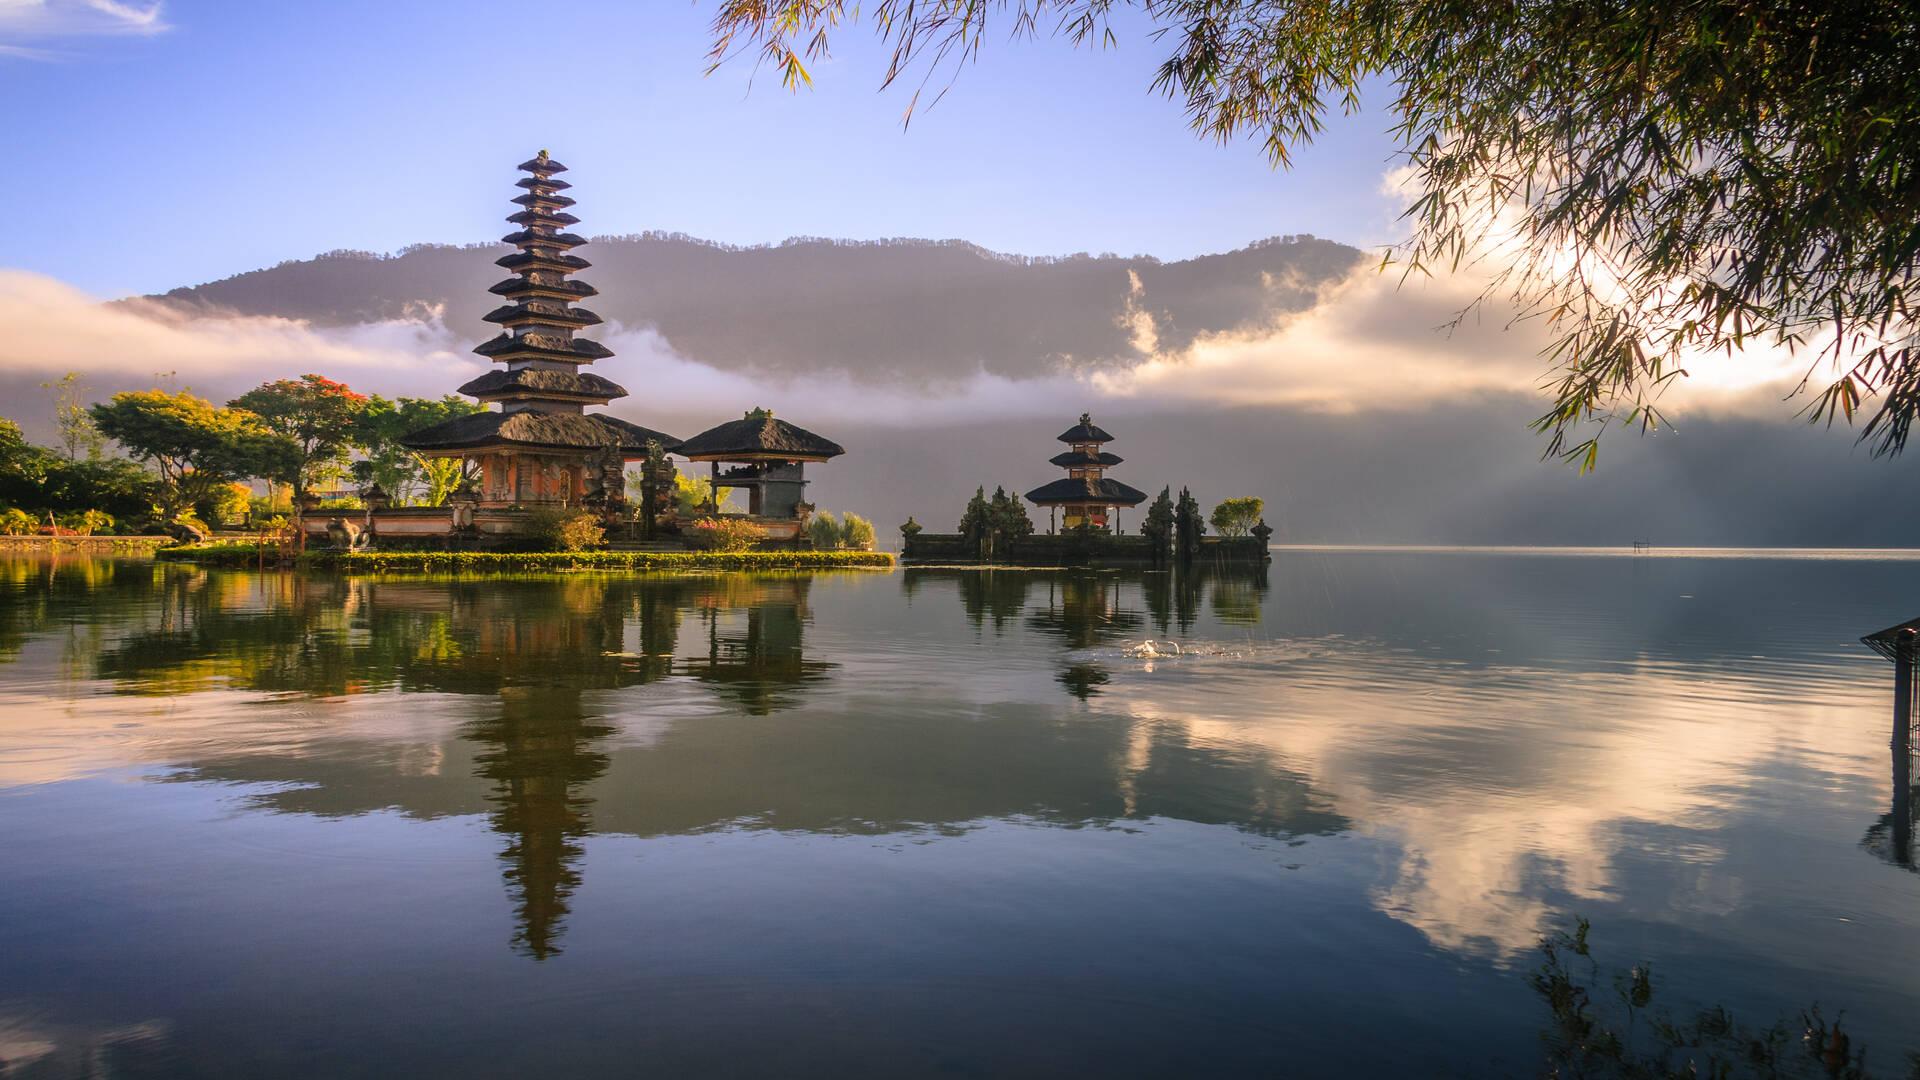 padang-bai-bali-to-gili-trawangan-island-lombok